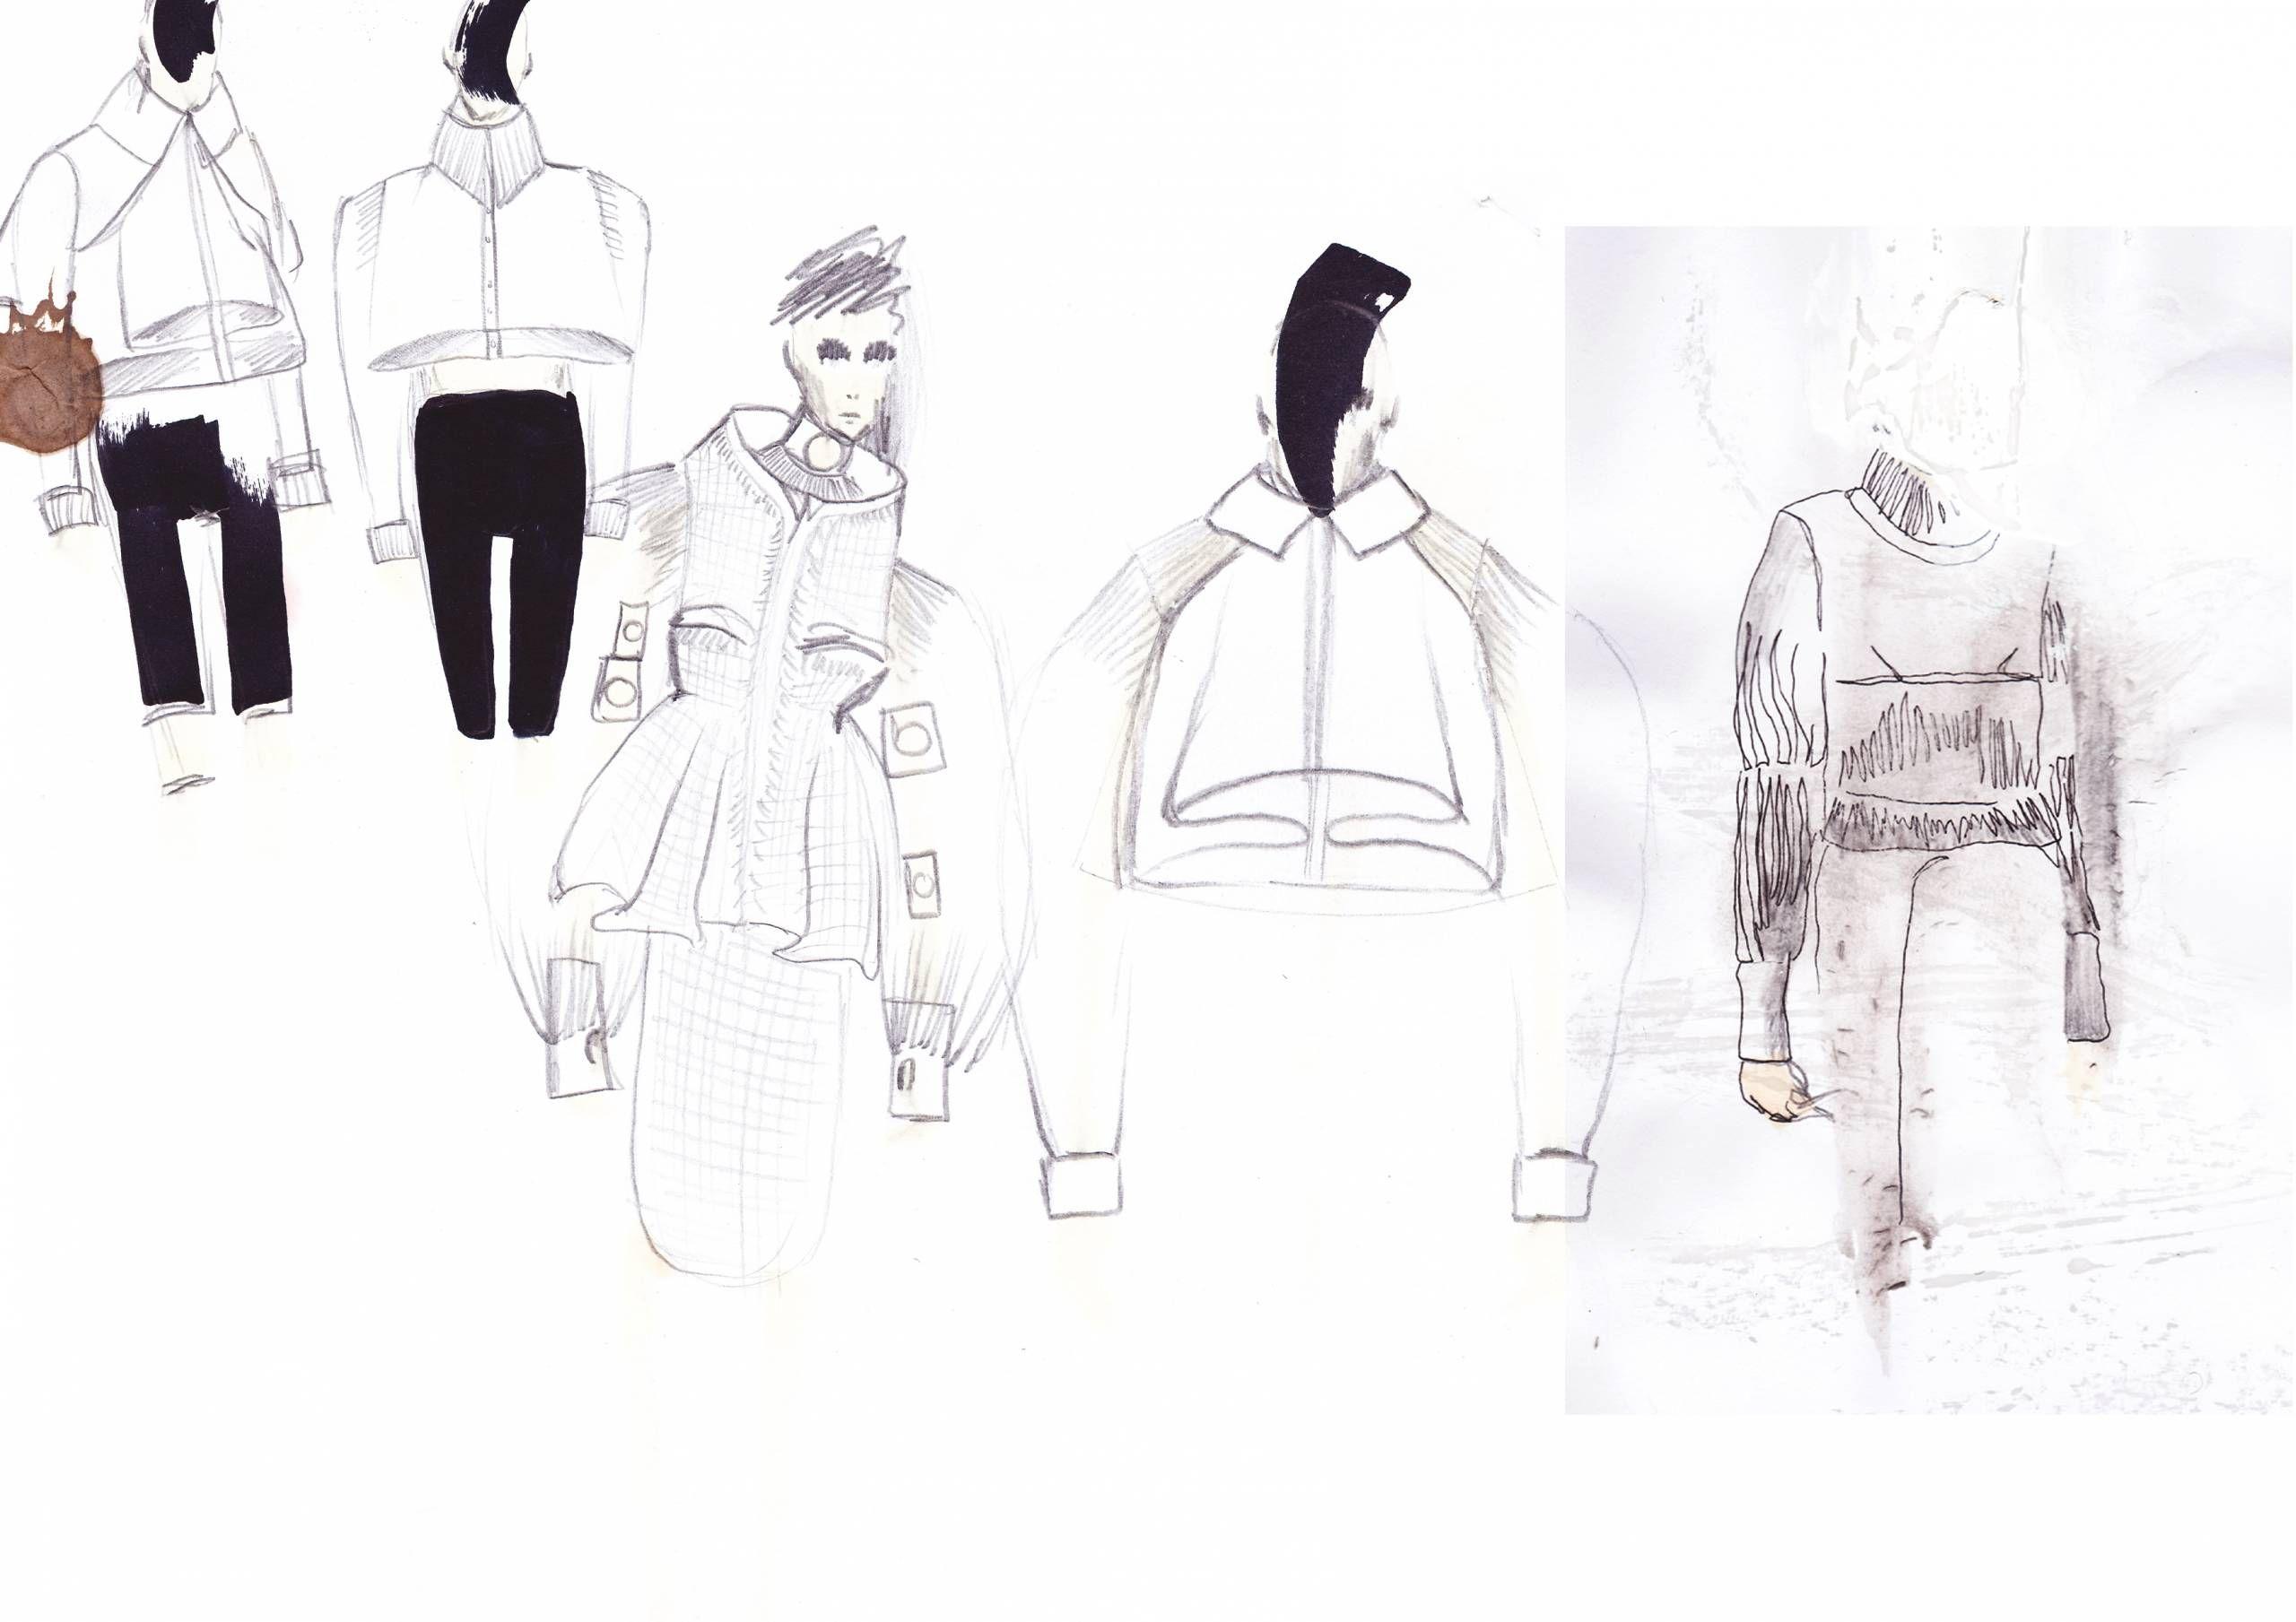 Shirt design sketches - Fashion Sketchbook Fashion Sketches For White Shirt Project Fashion Portfolio Kevin Germanier